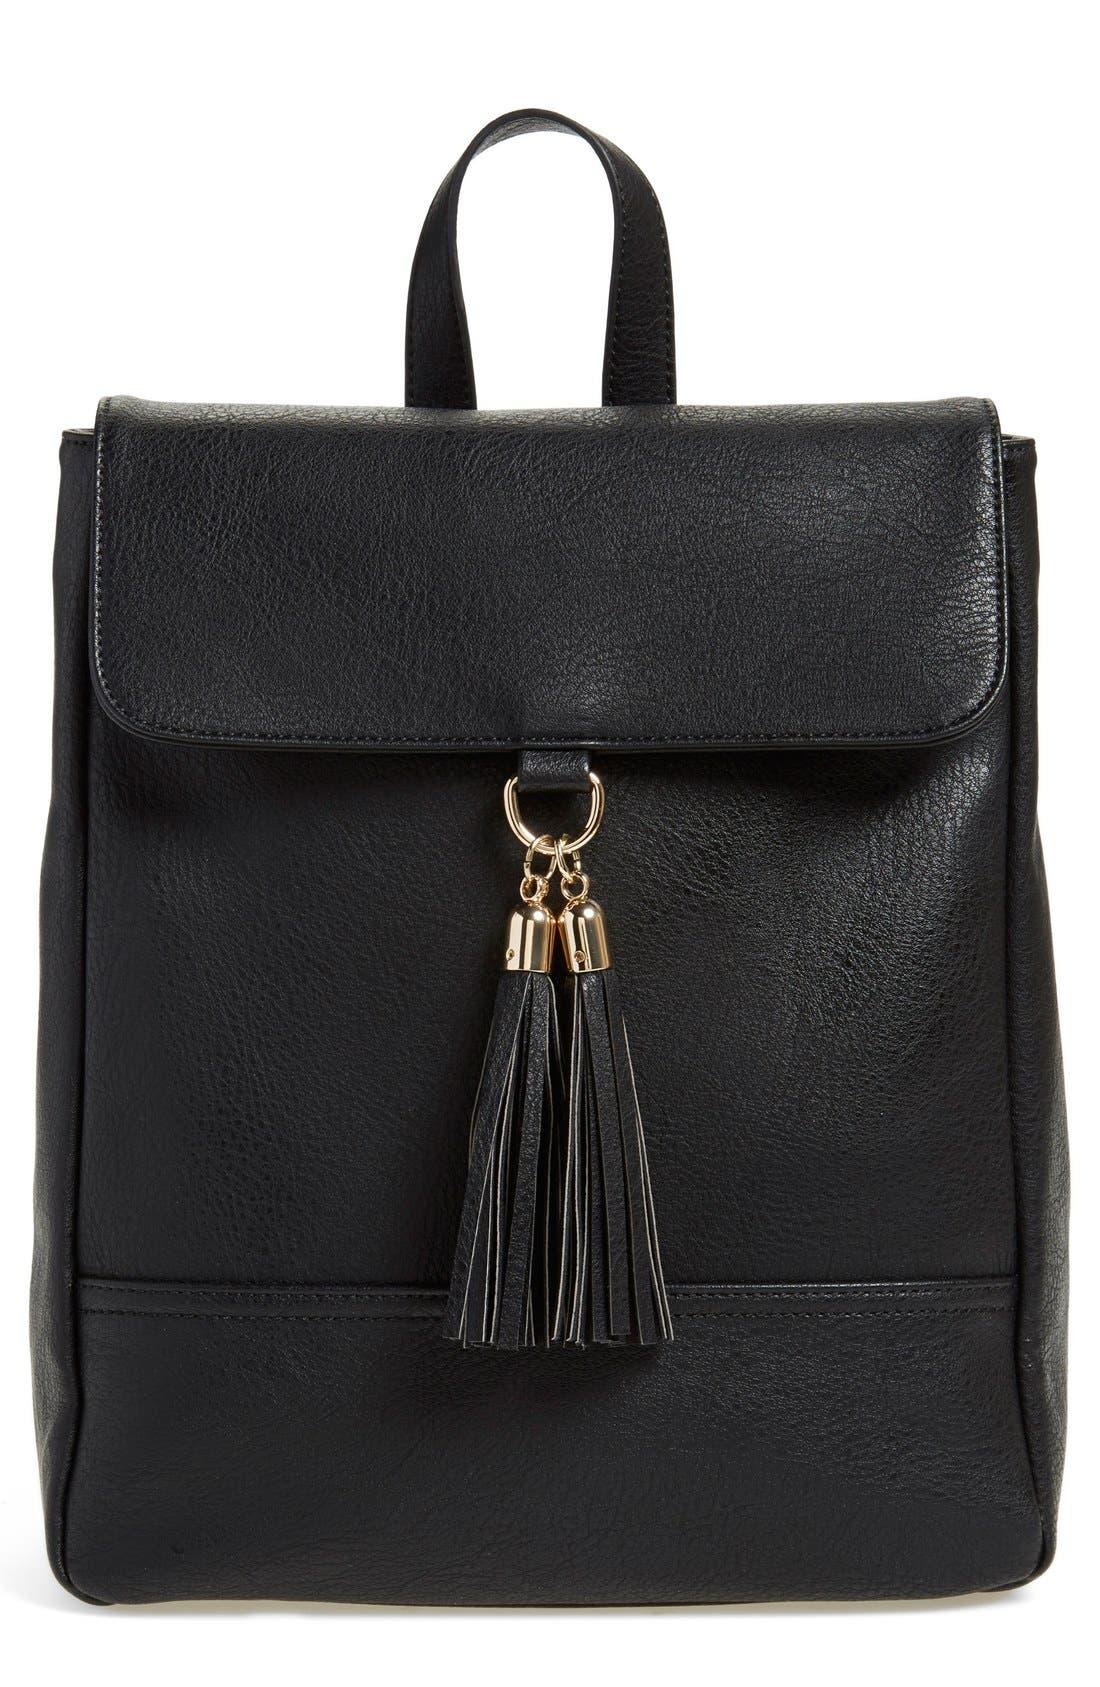 Alternate Image 1 Selected - Sole Society 'Ellie' Backpack